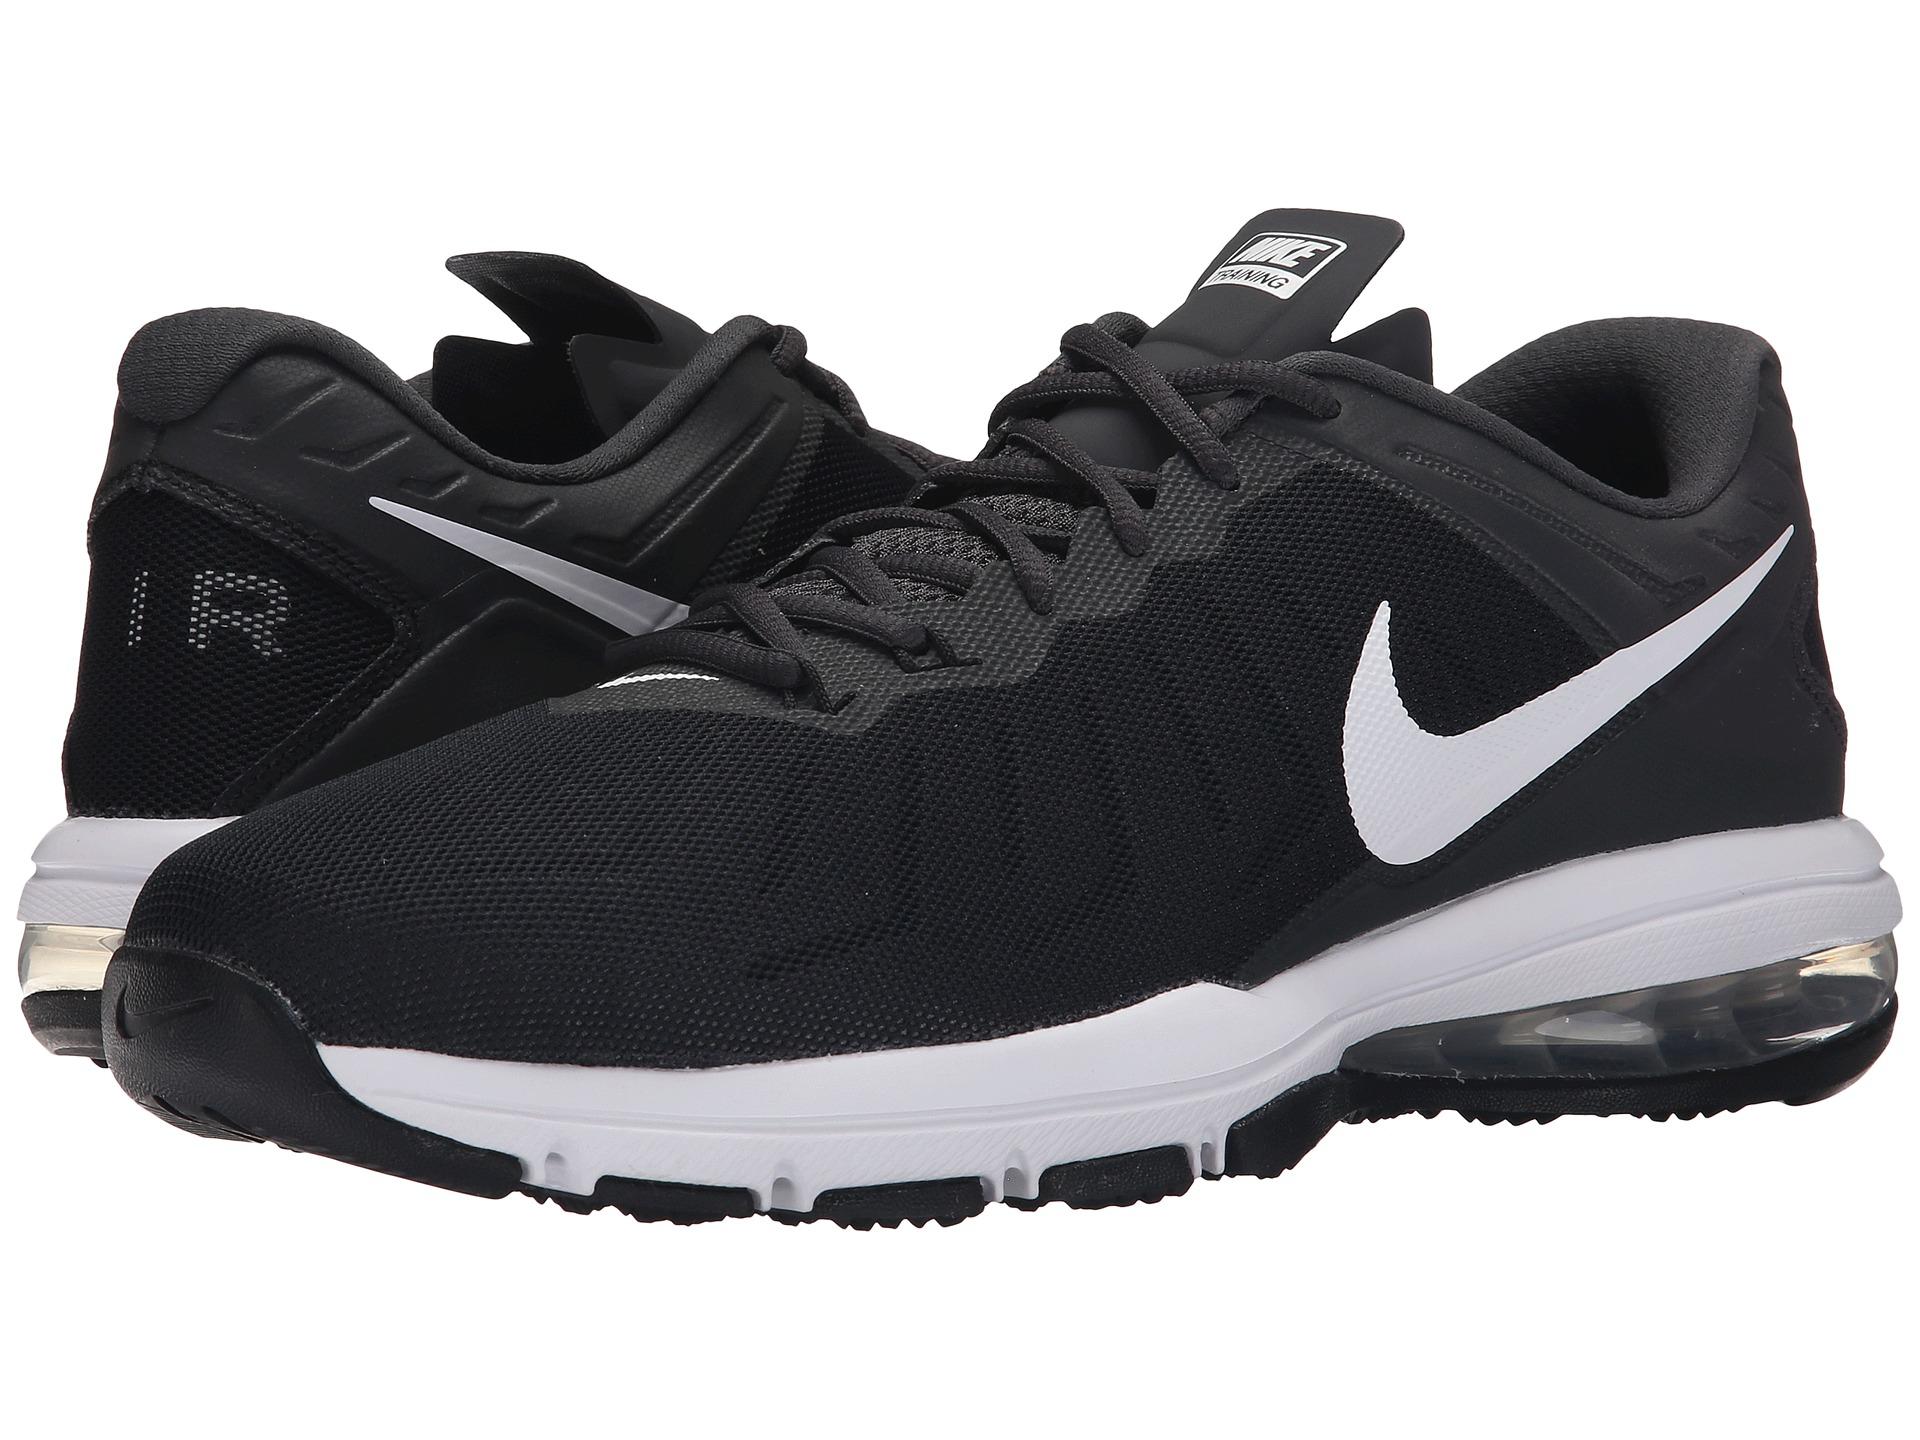 Lyst - Nike Air Max Full Ride Tr in Black for Men